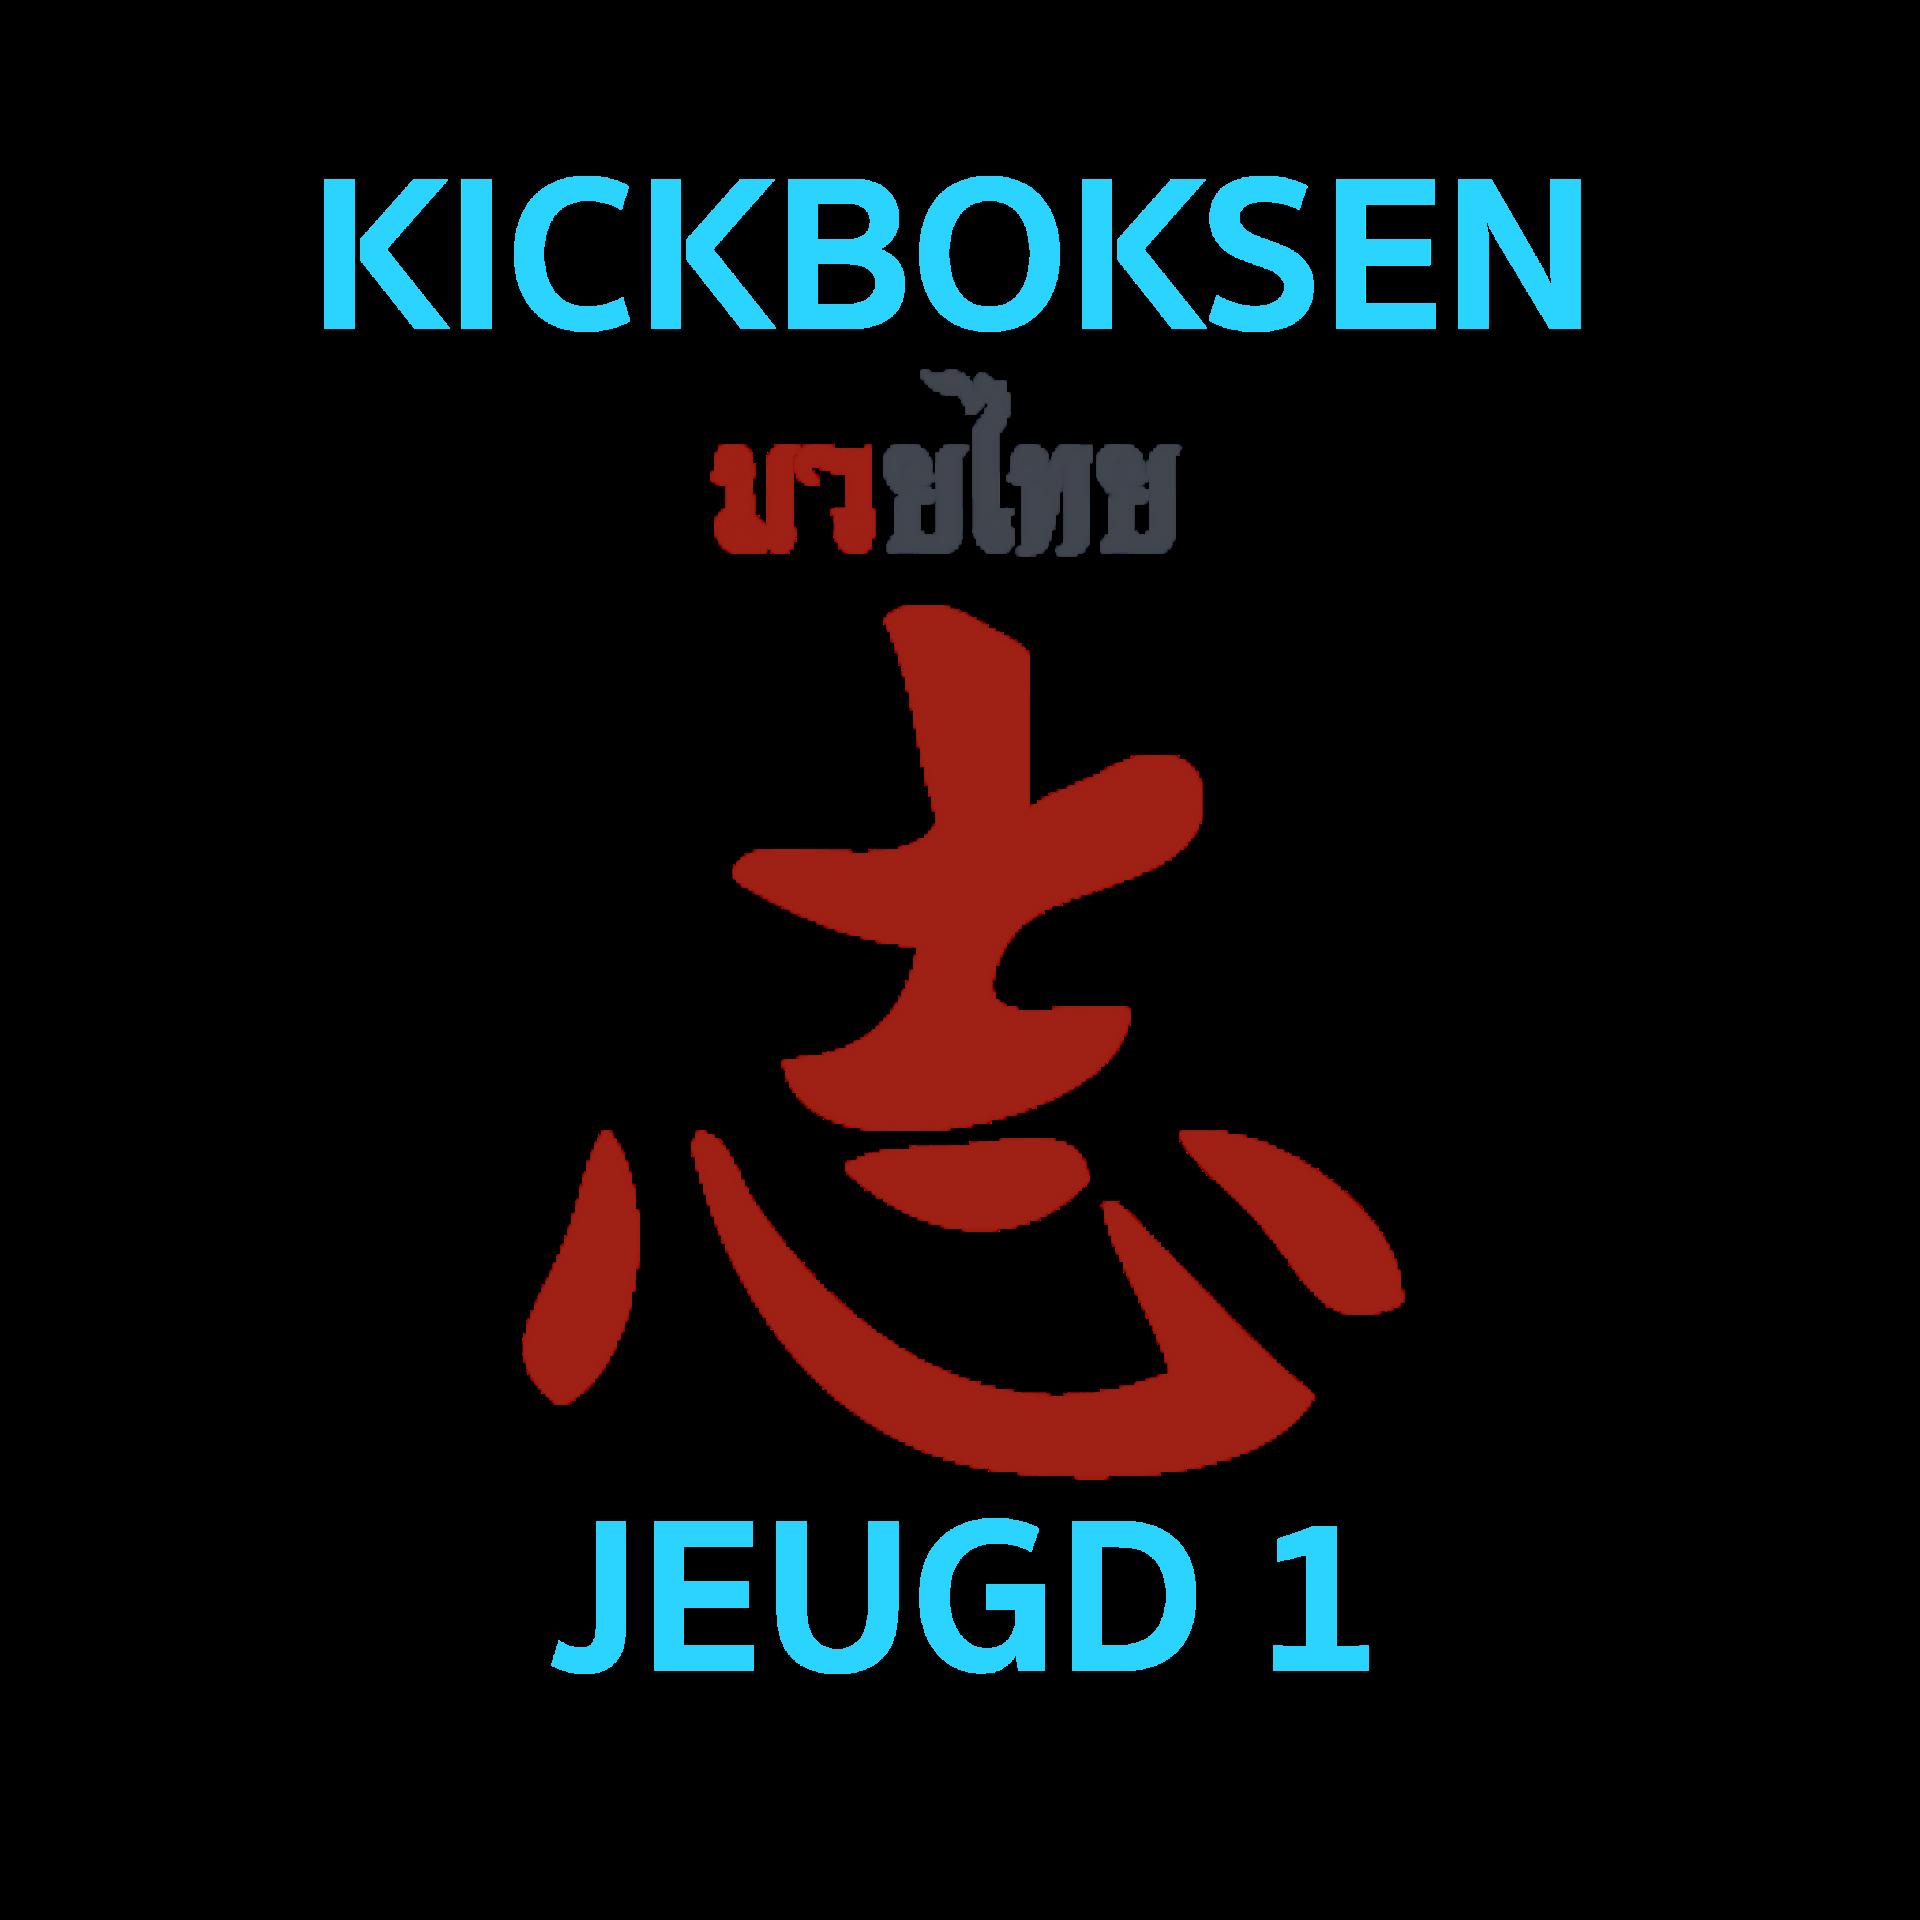 Examen Kickboksen Jeugd